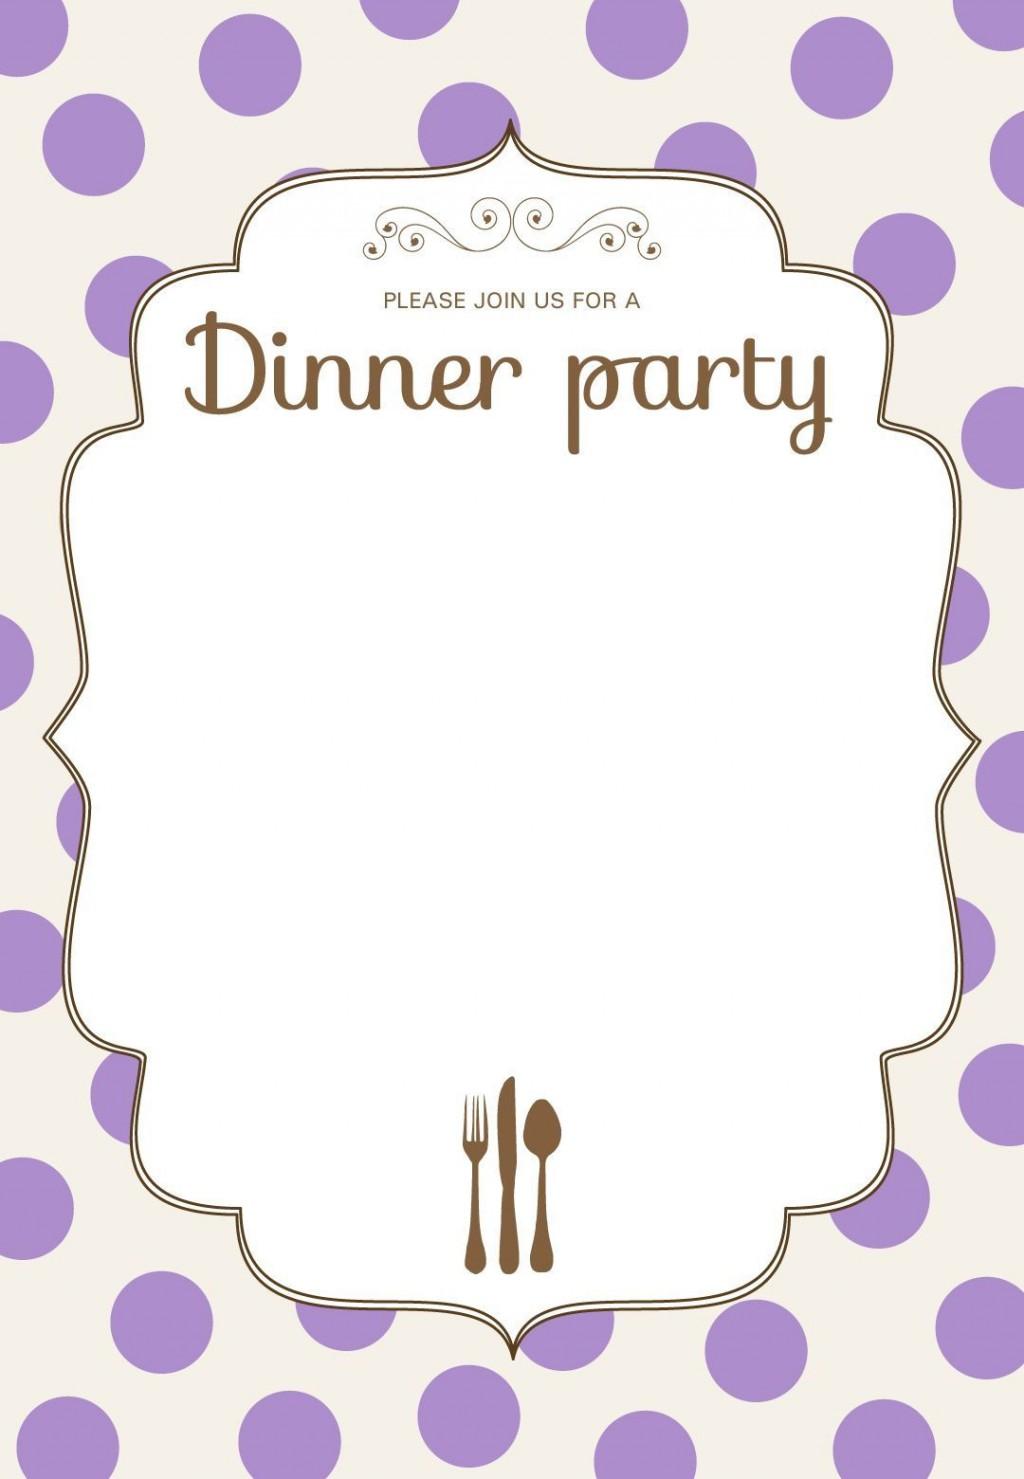 009 Stirring Free Dinner Invitation Template Highest Clarity  Templates Rehearsal Printable Italian ThanksgivingLarge